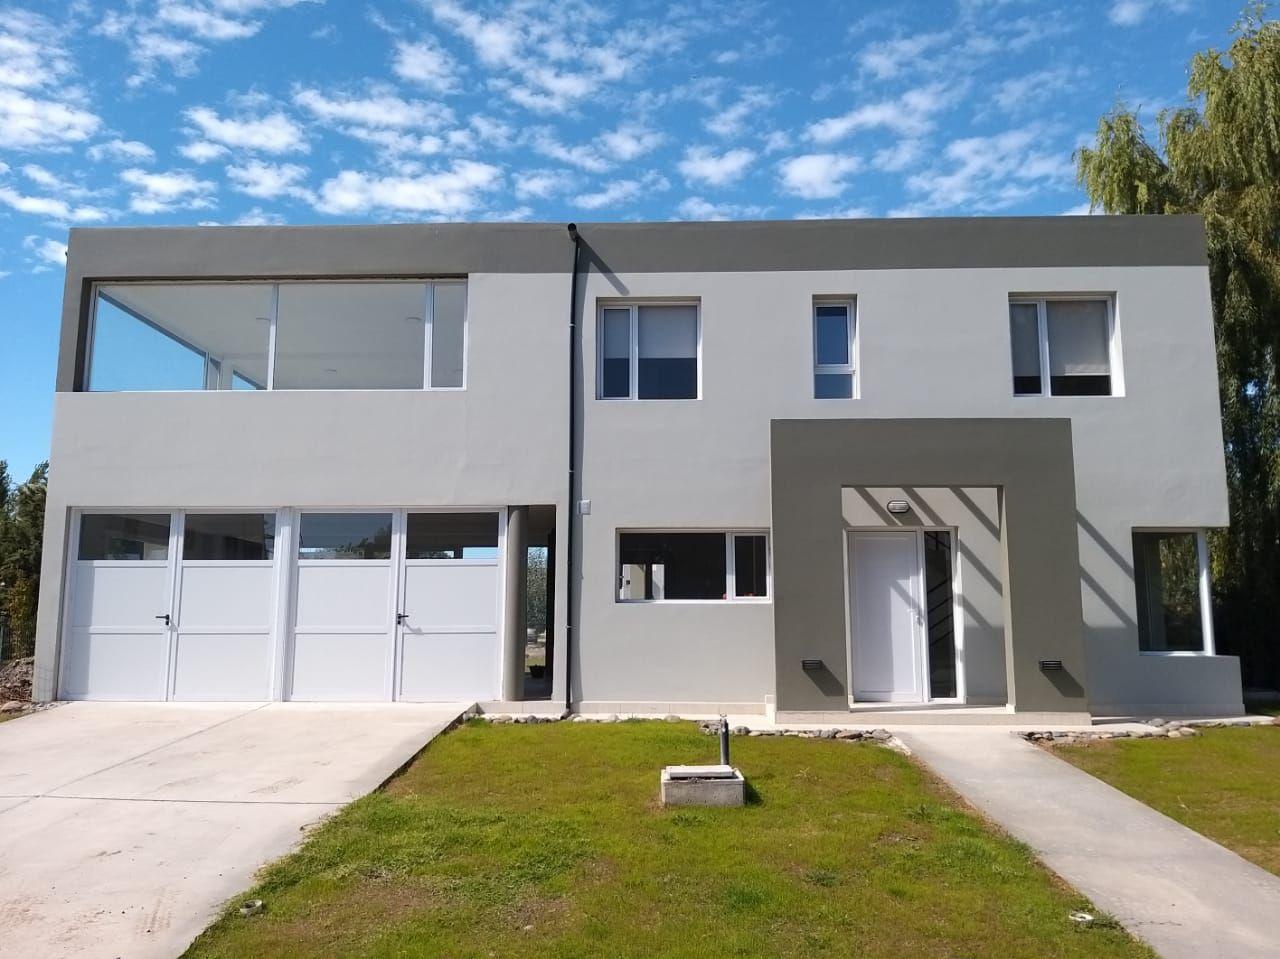 Casa en Neuquén, Confluencia Urbana | VIF881 | Viñuela & Ferracioli Servicios Inmobiliarios